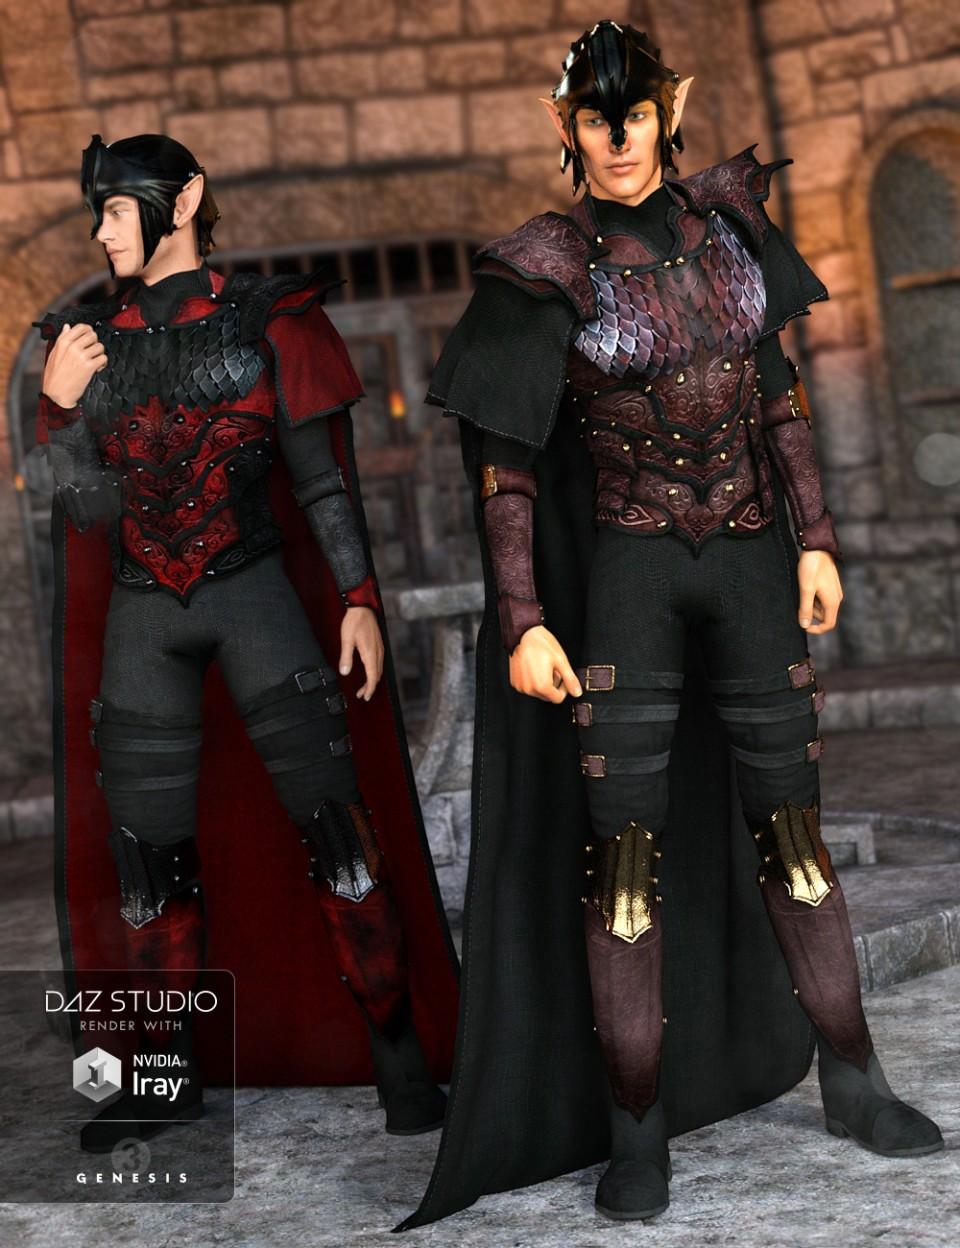 Elven Knight Armor Male Textures_DAZ3D下载站